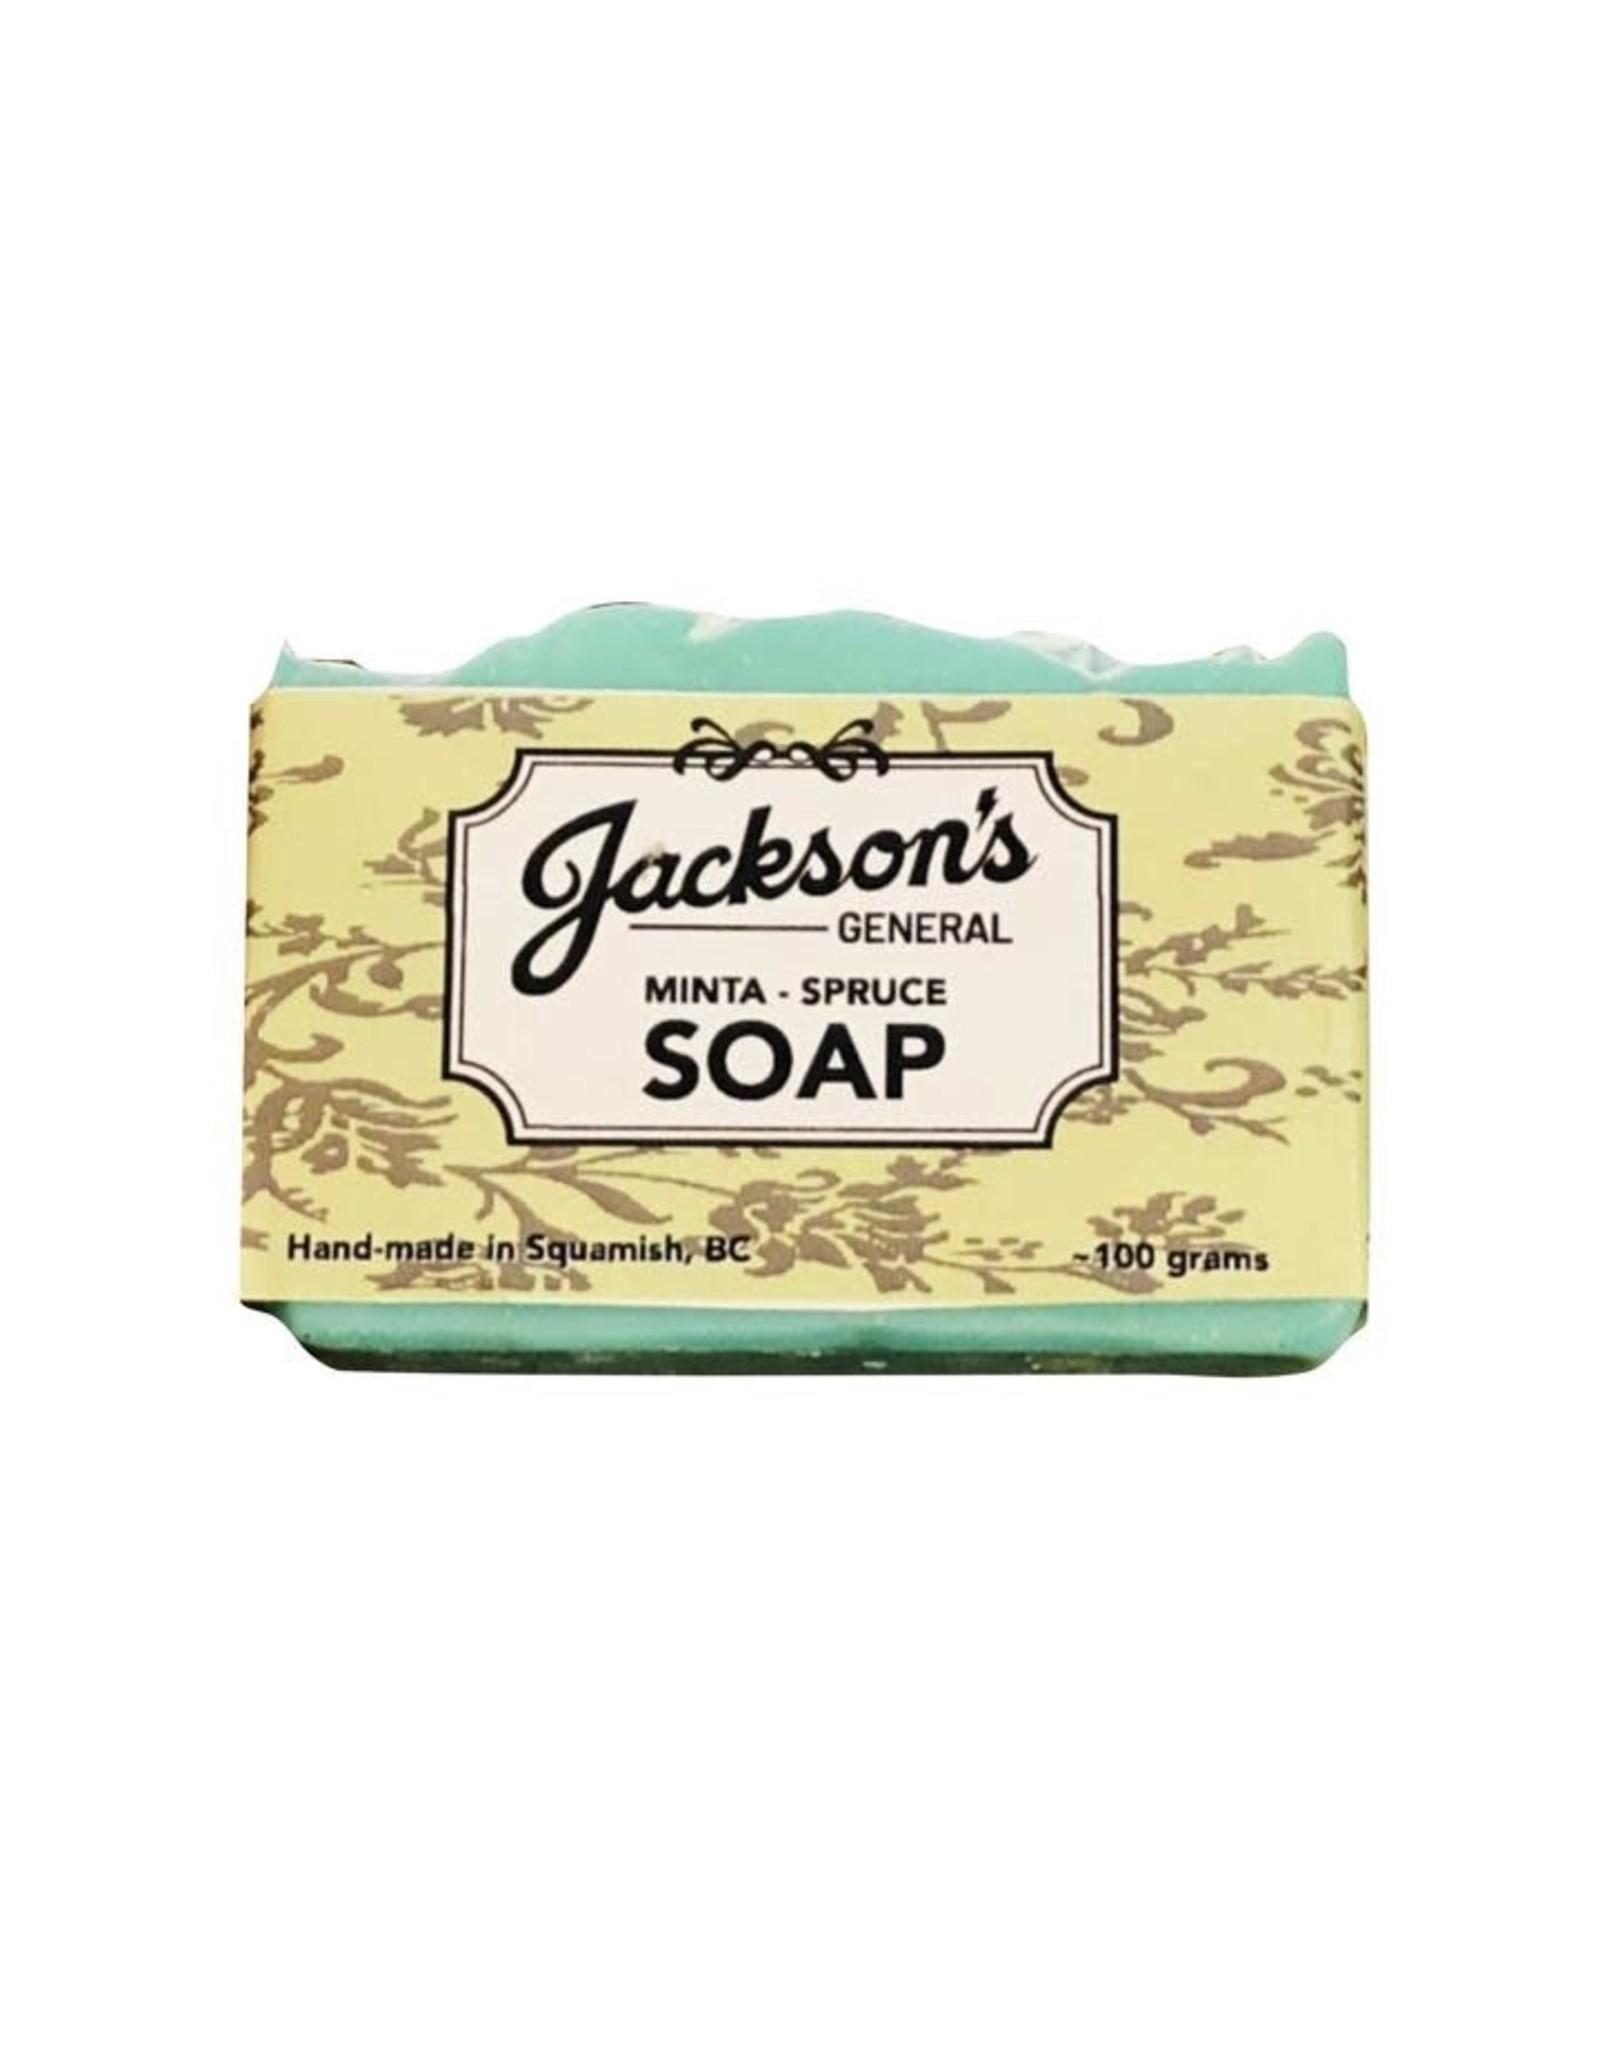 Jackson's General Jackson's General Soap Mint